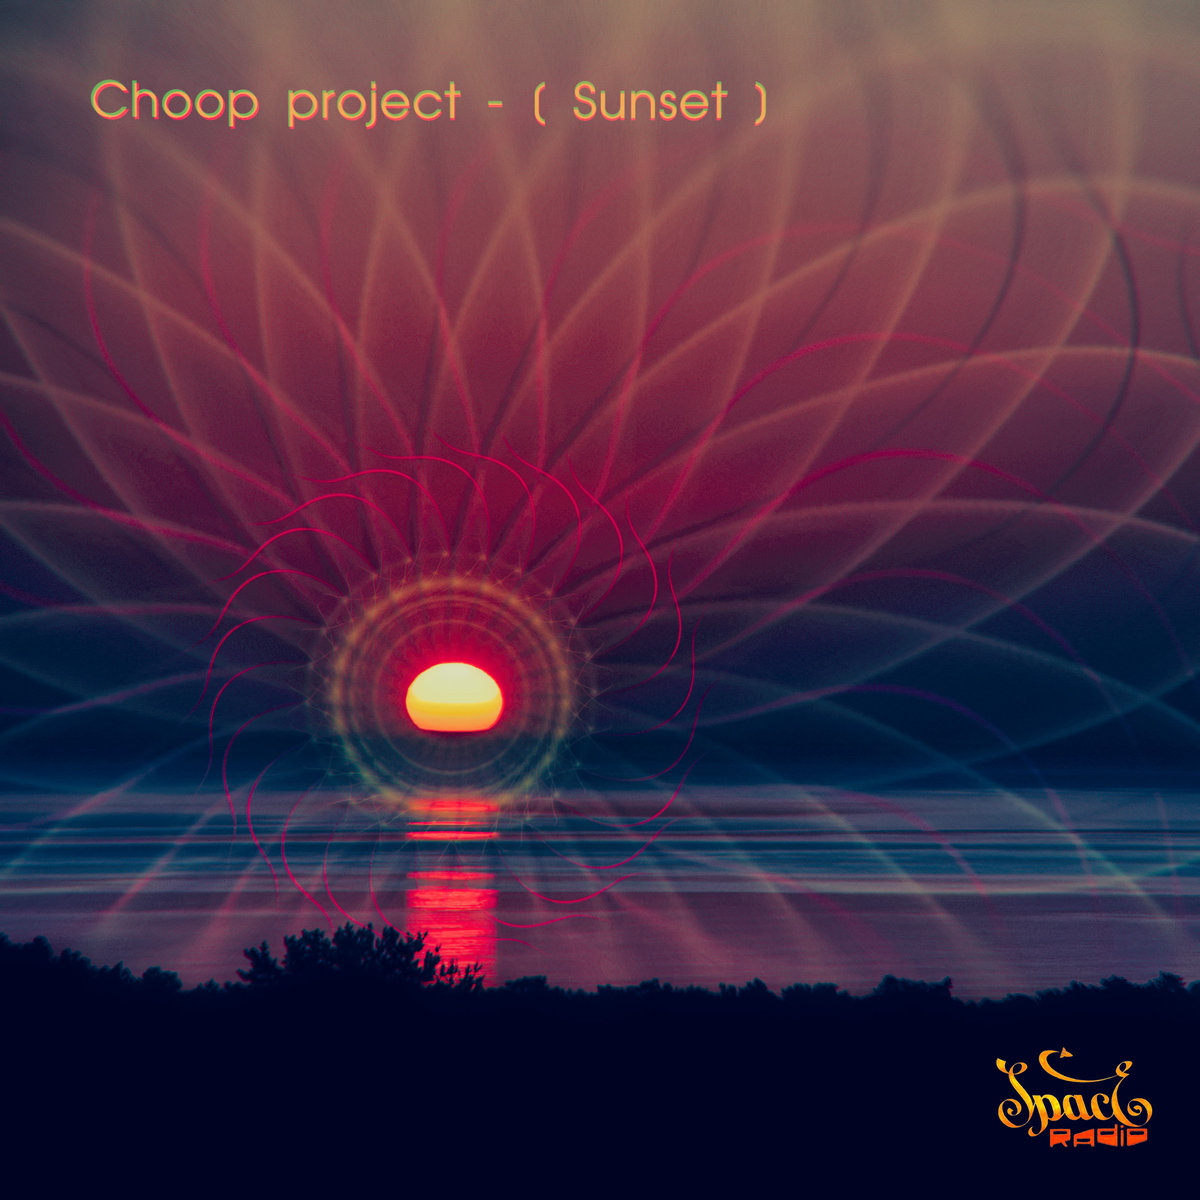 Choop Project - Sunset